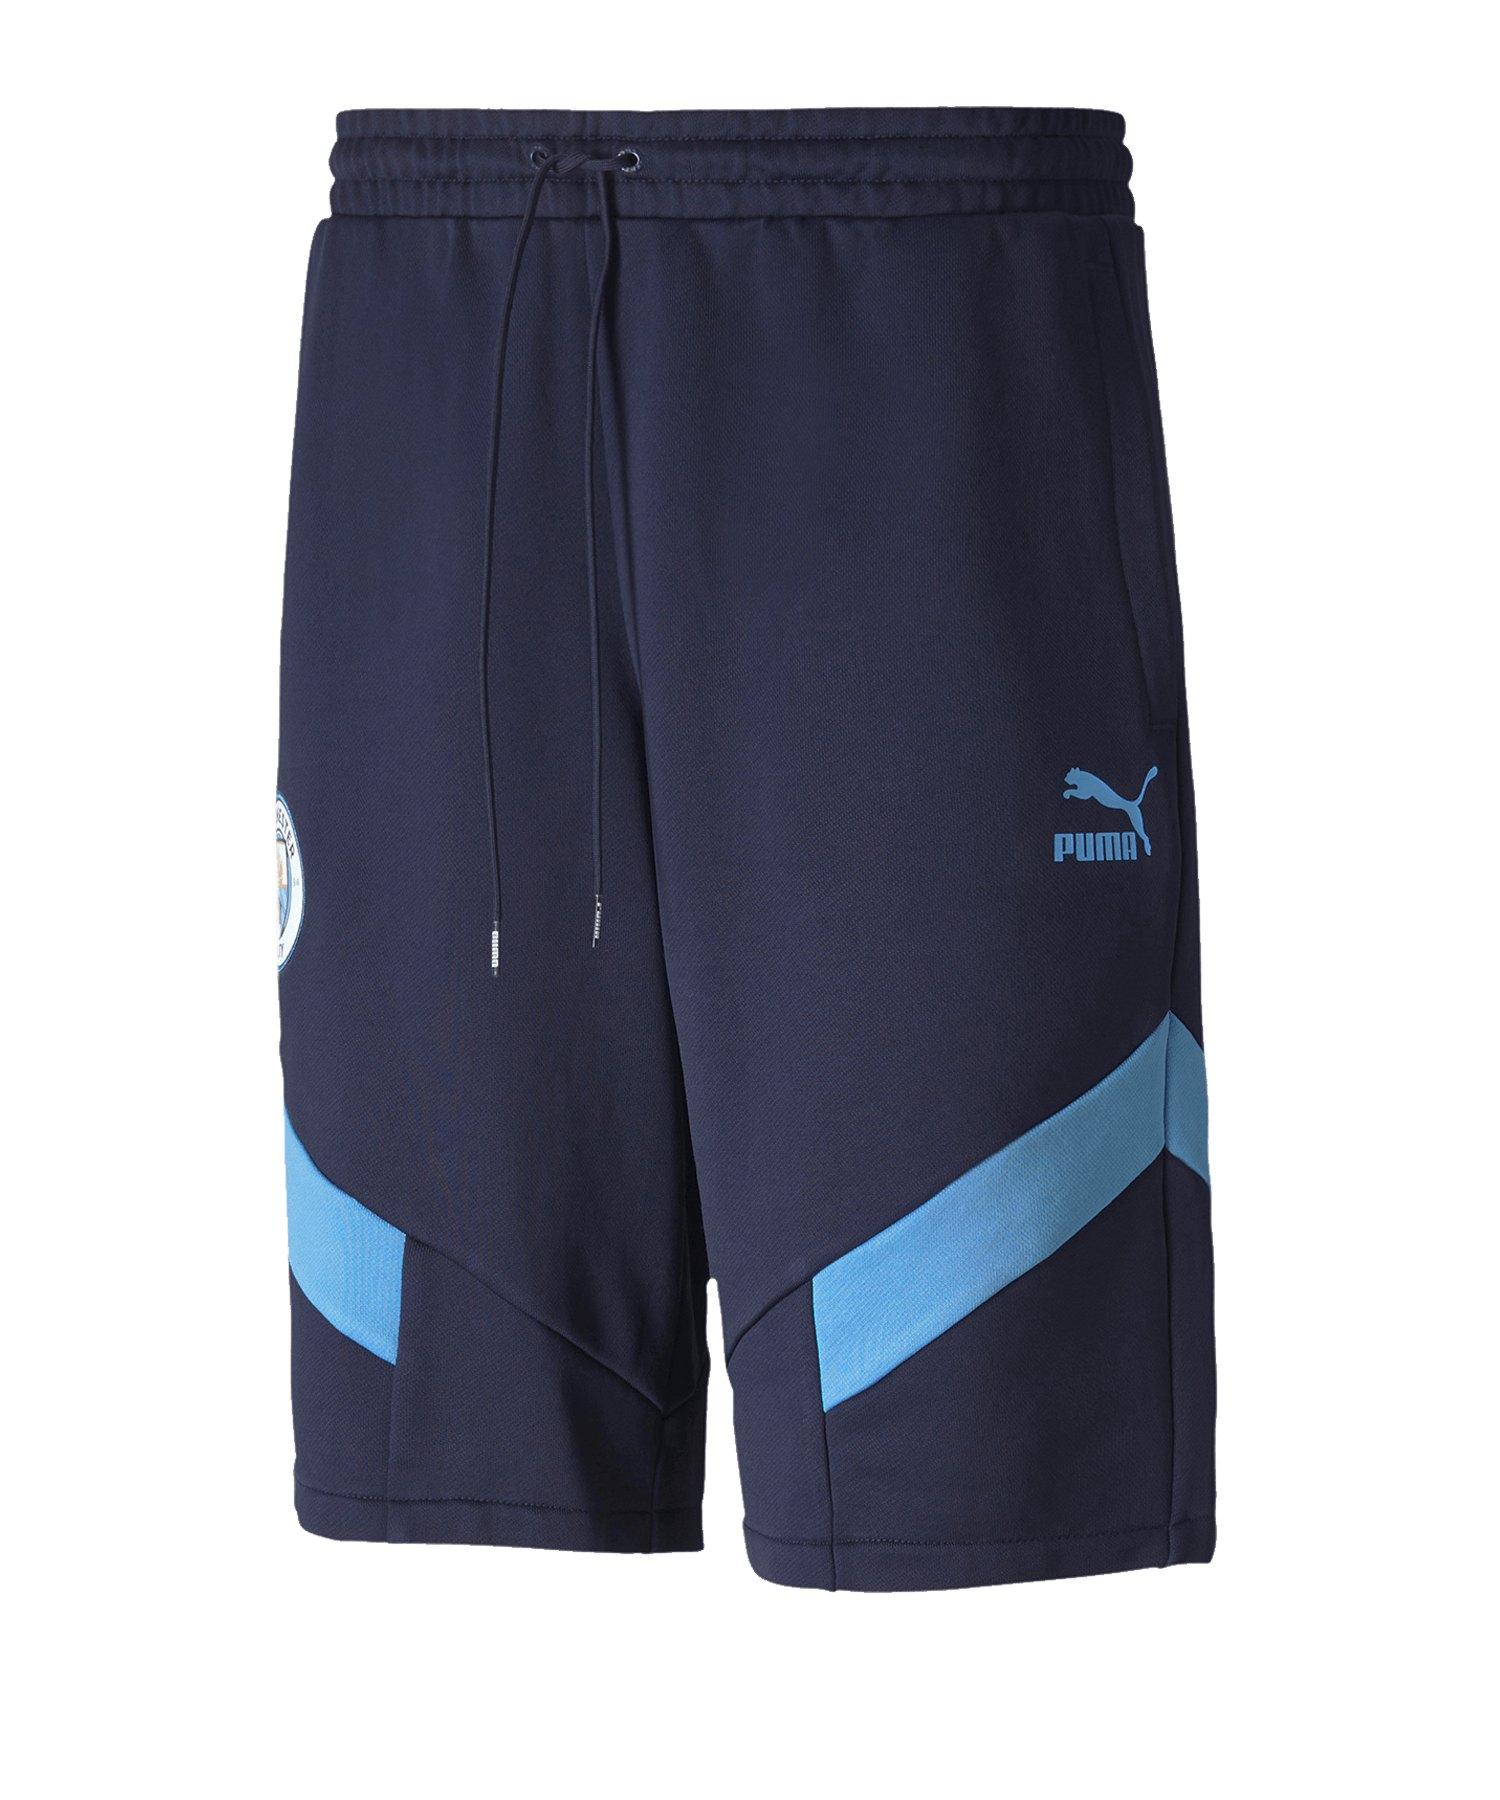 Puma Manchester City Iconic MCS Short Blau F25 - blau